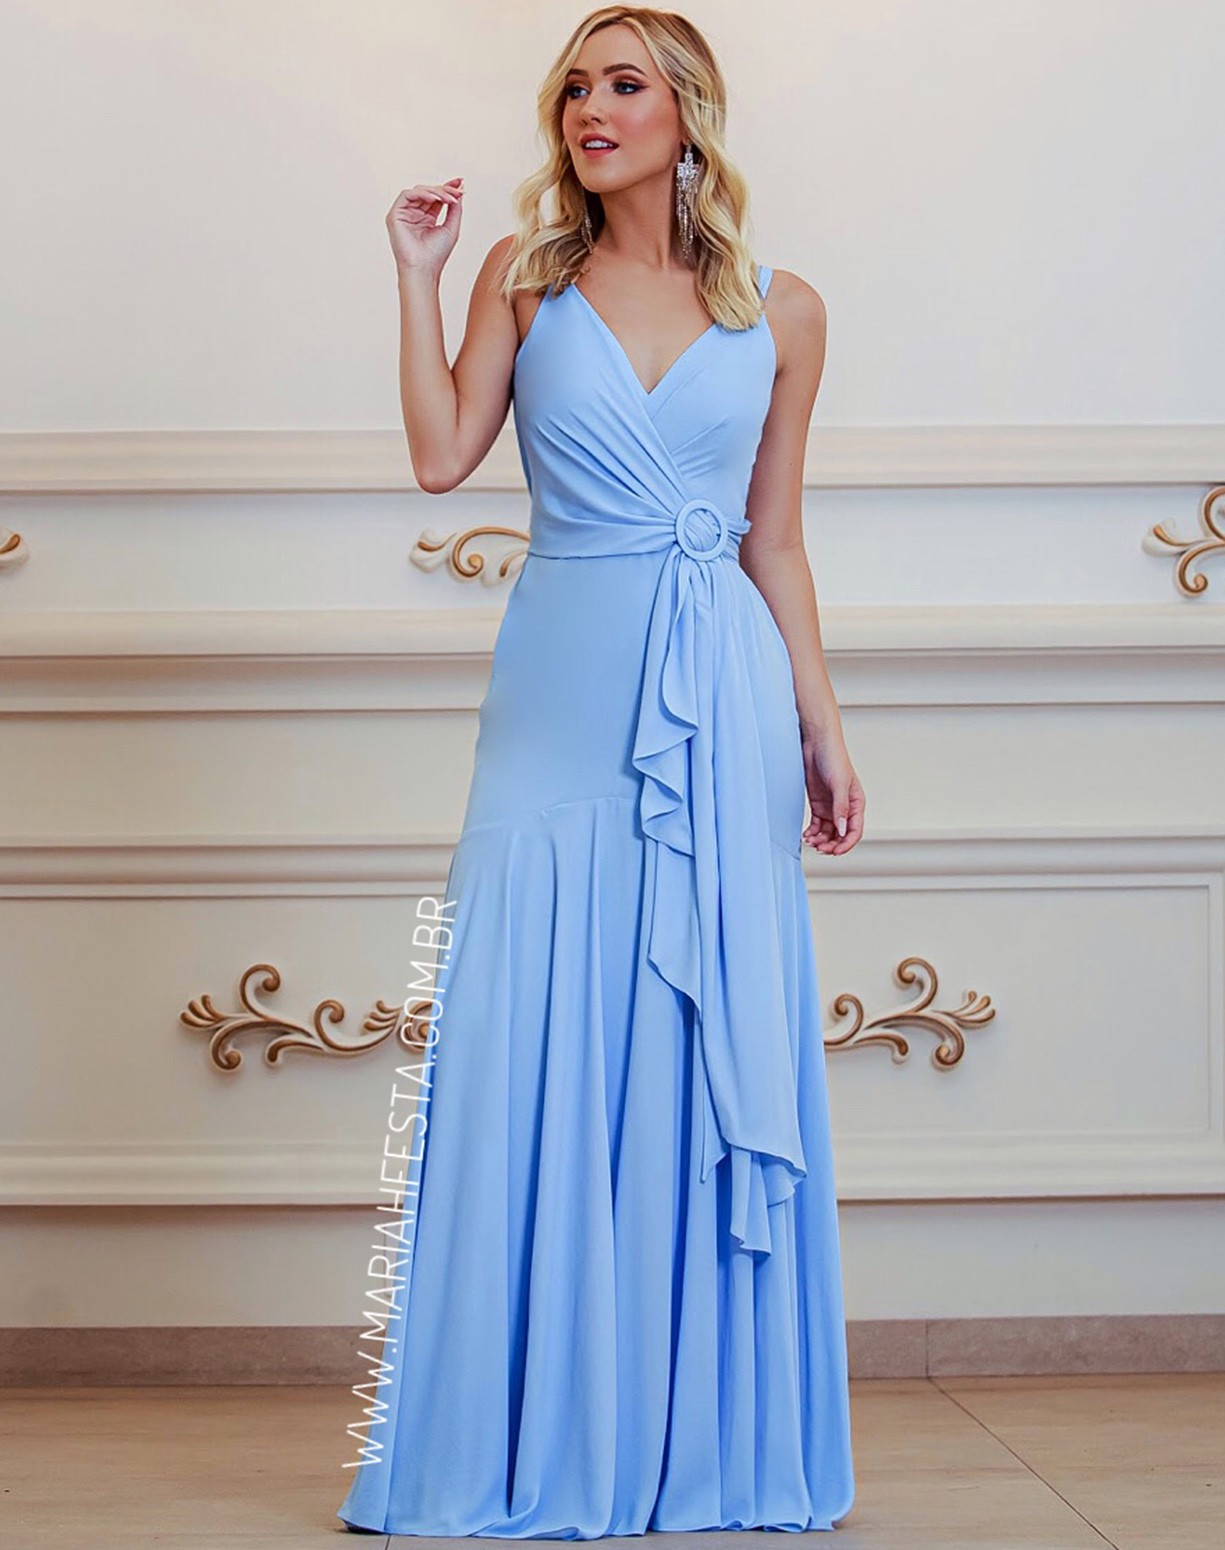 Vestido Azul Serenity Semi Sereia com Decote